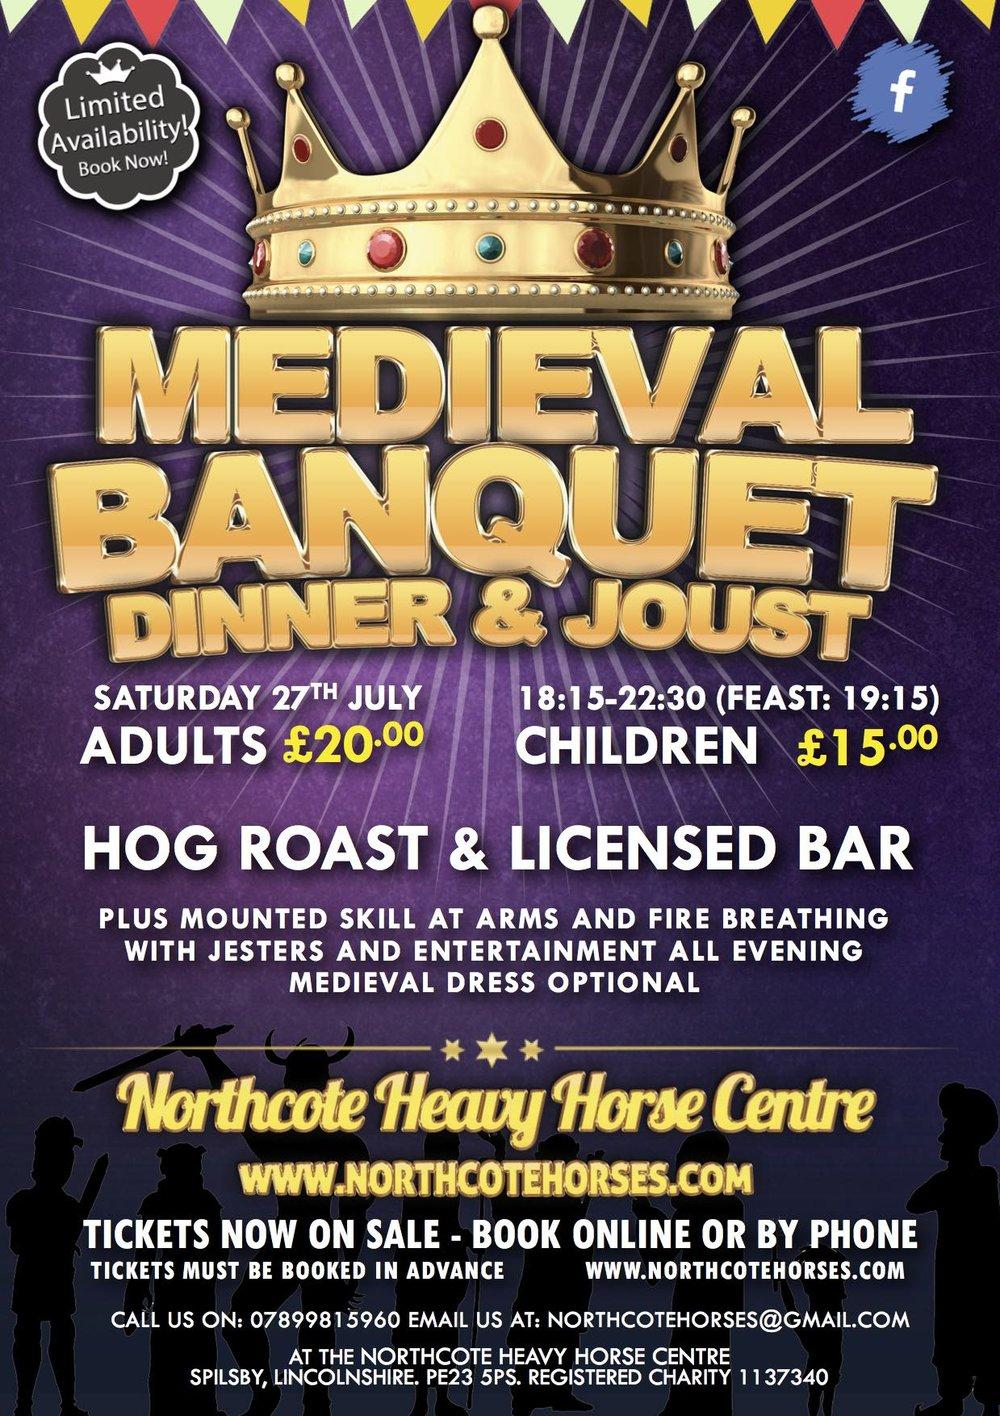 Medieval Banquet Poster May 2014.jpg